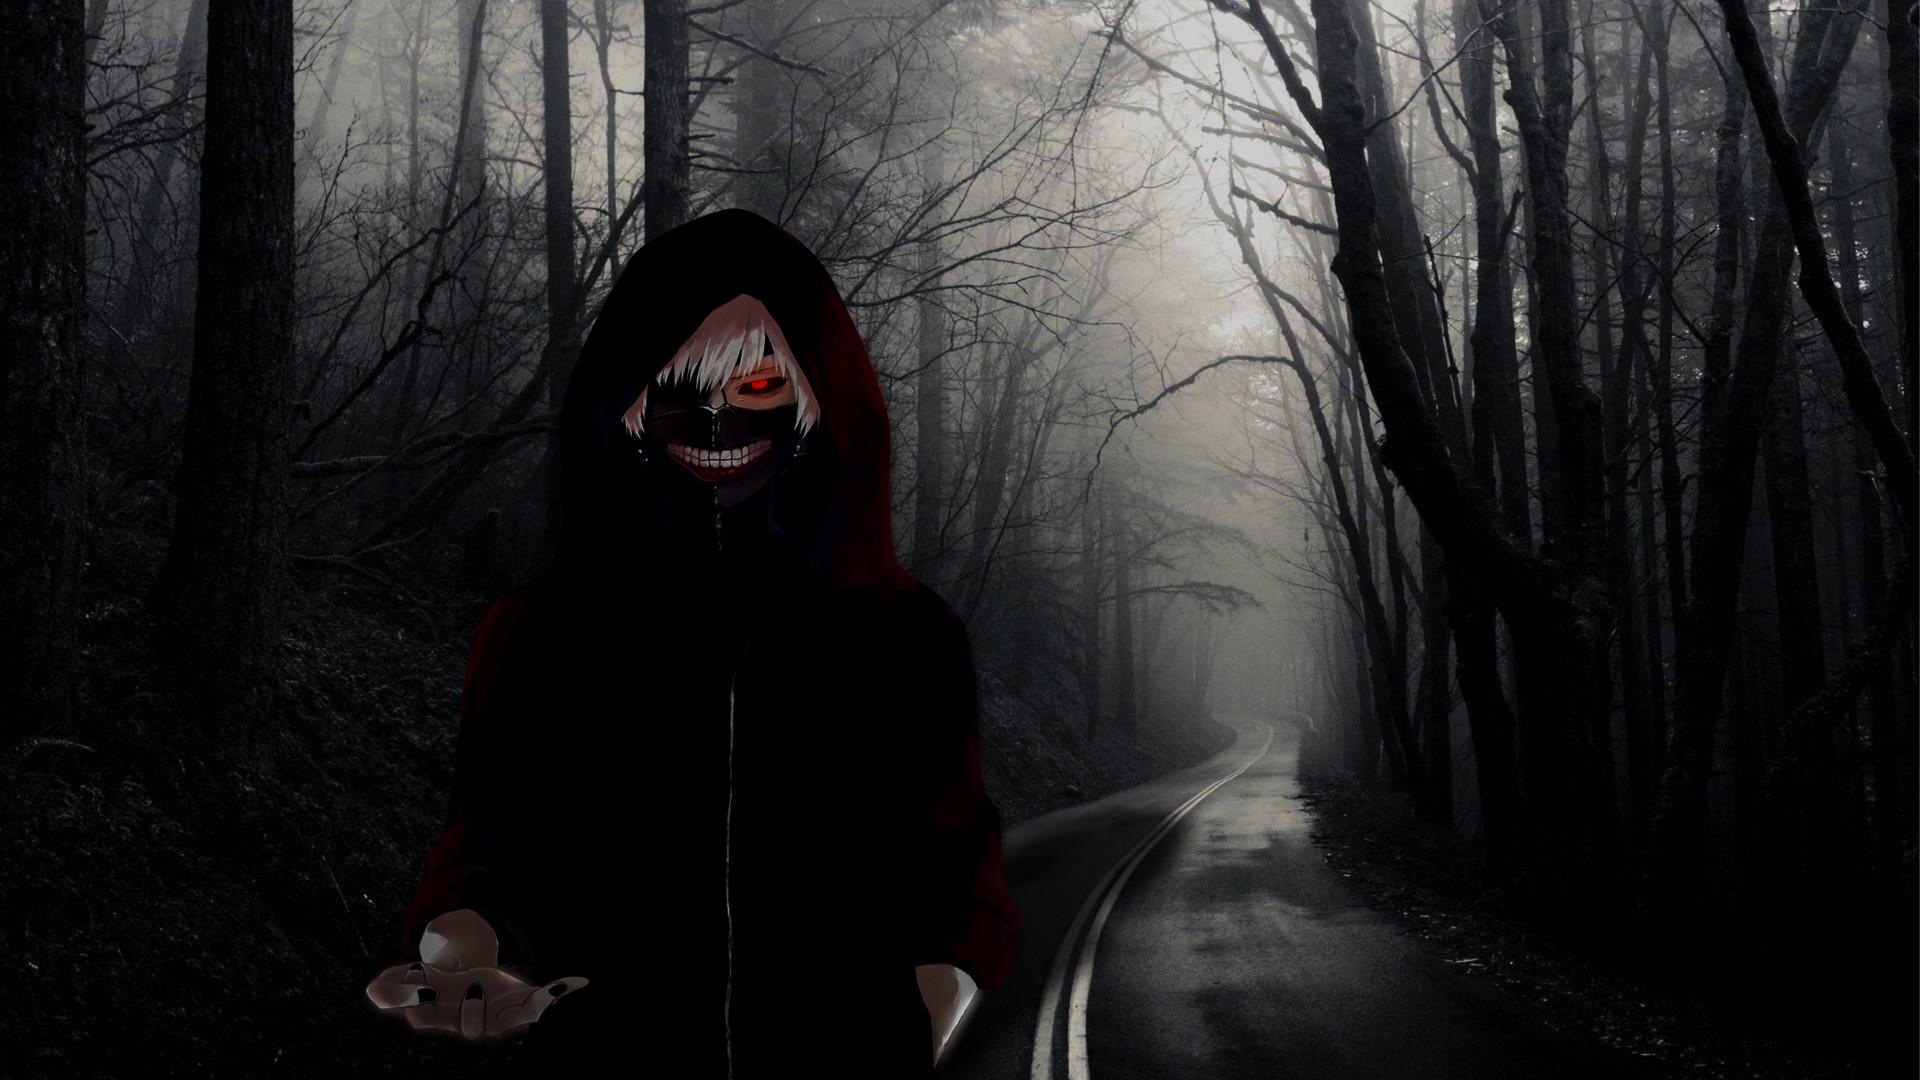 Tokyo Ghoul [Kaneki Ghoul] – Wallpaper by Exotimer on DeviantArt